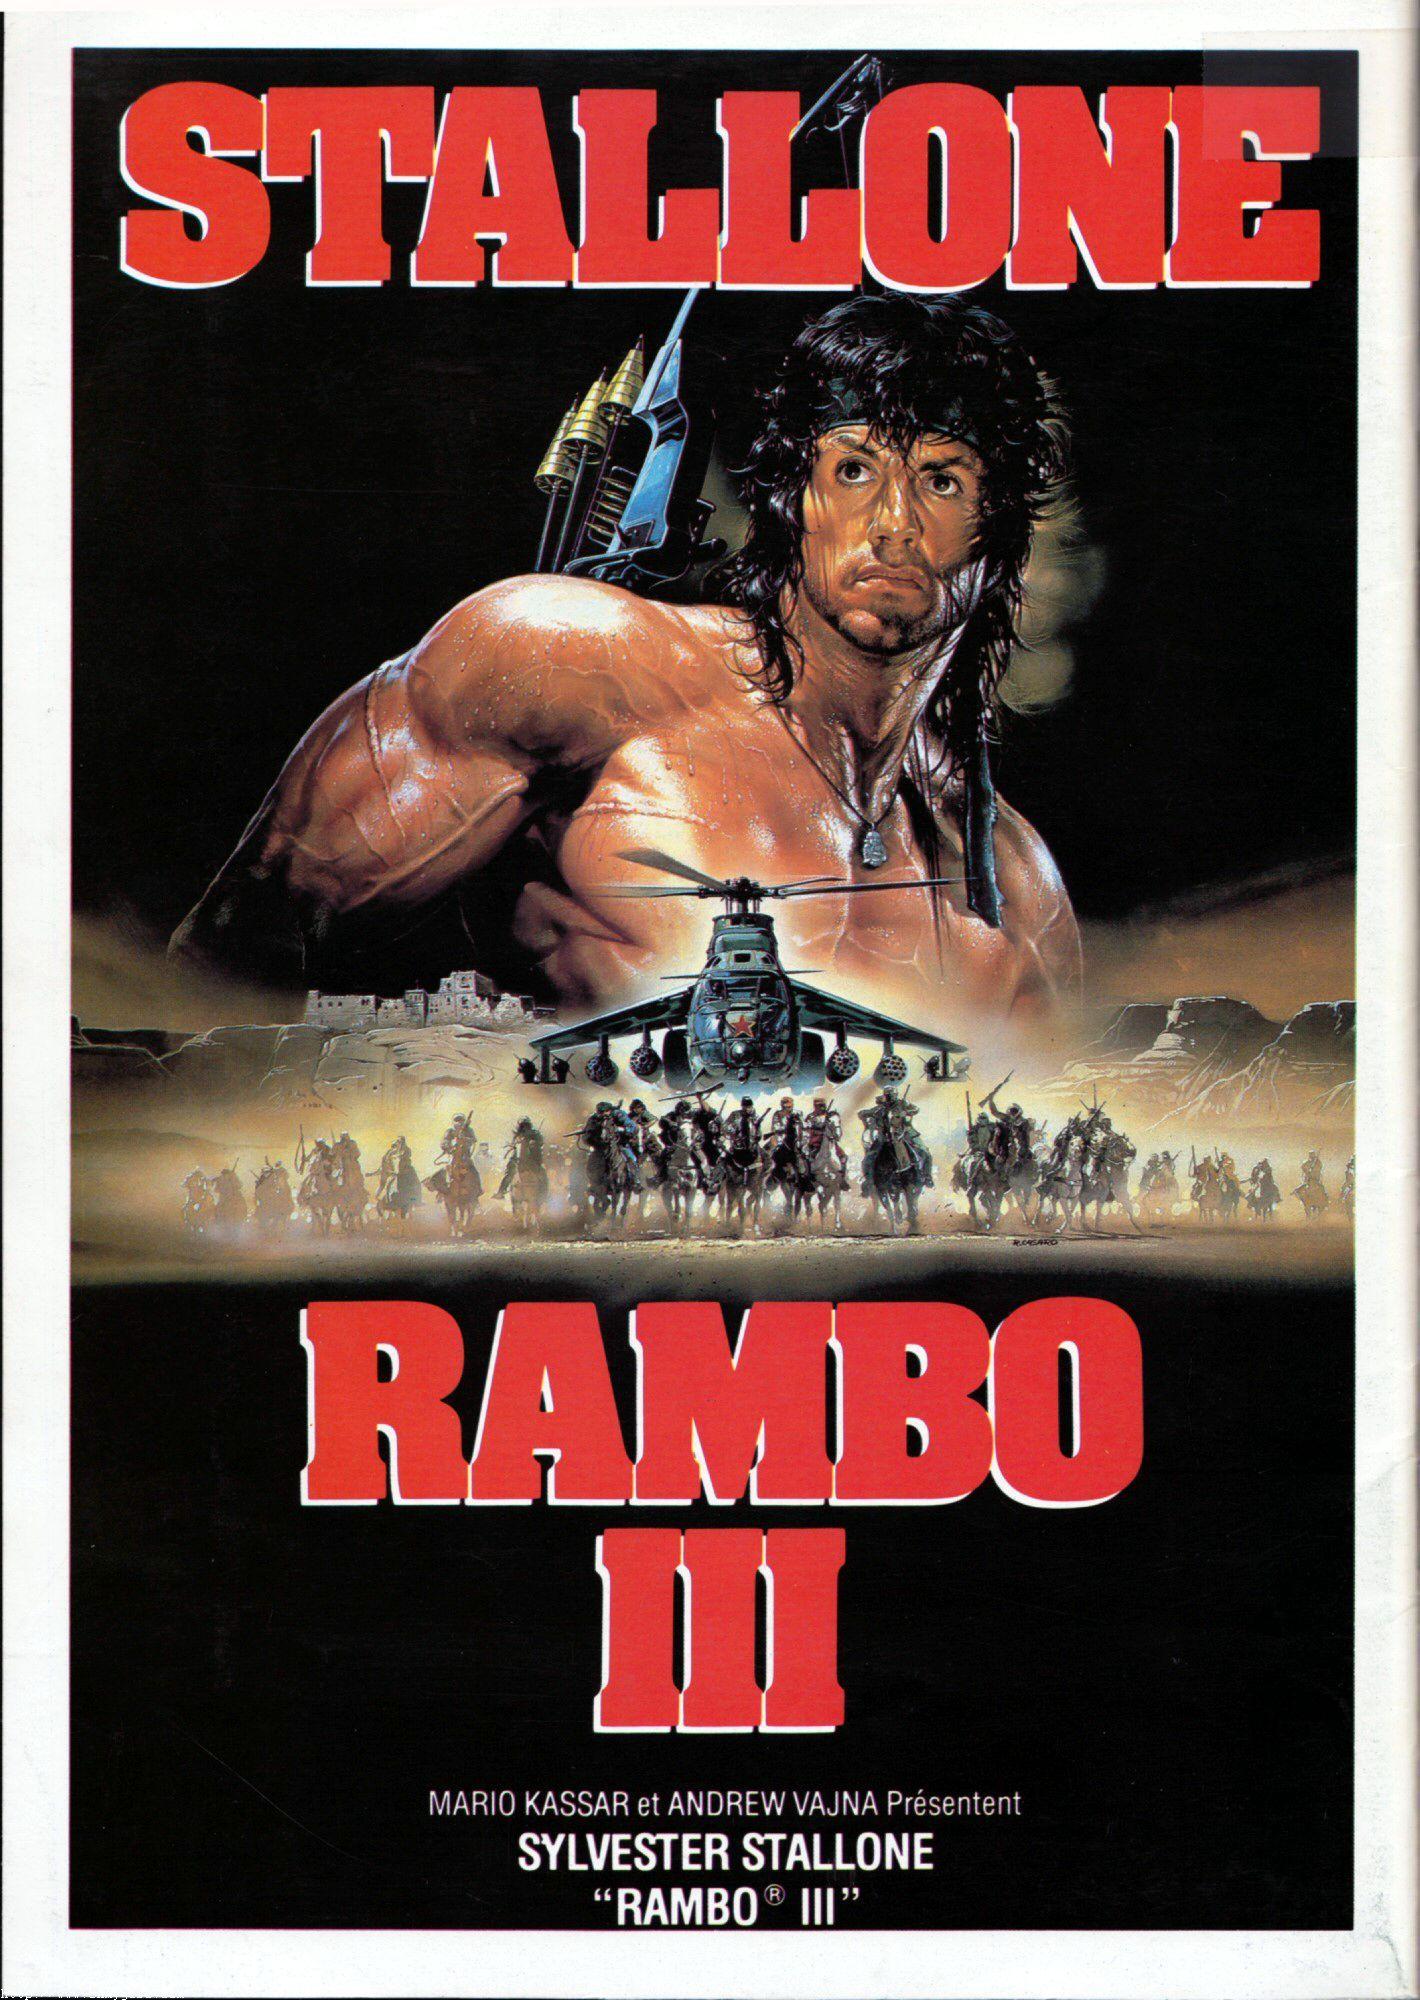 http://www.ohmygore.com/movies/rambo_3/a.jpg